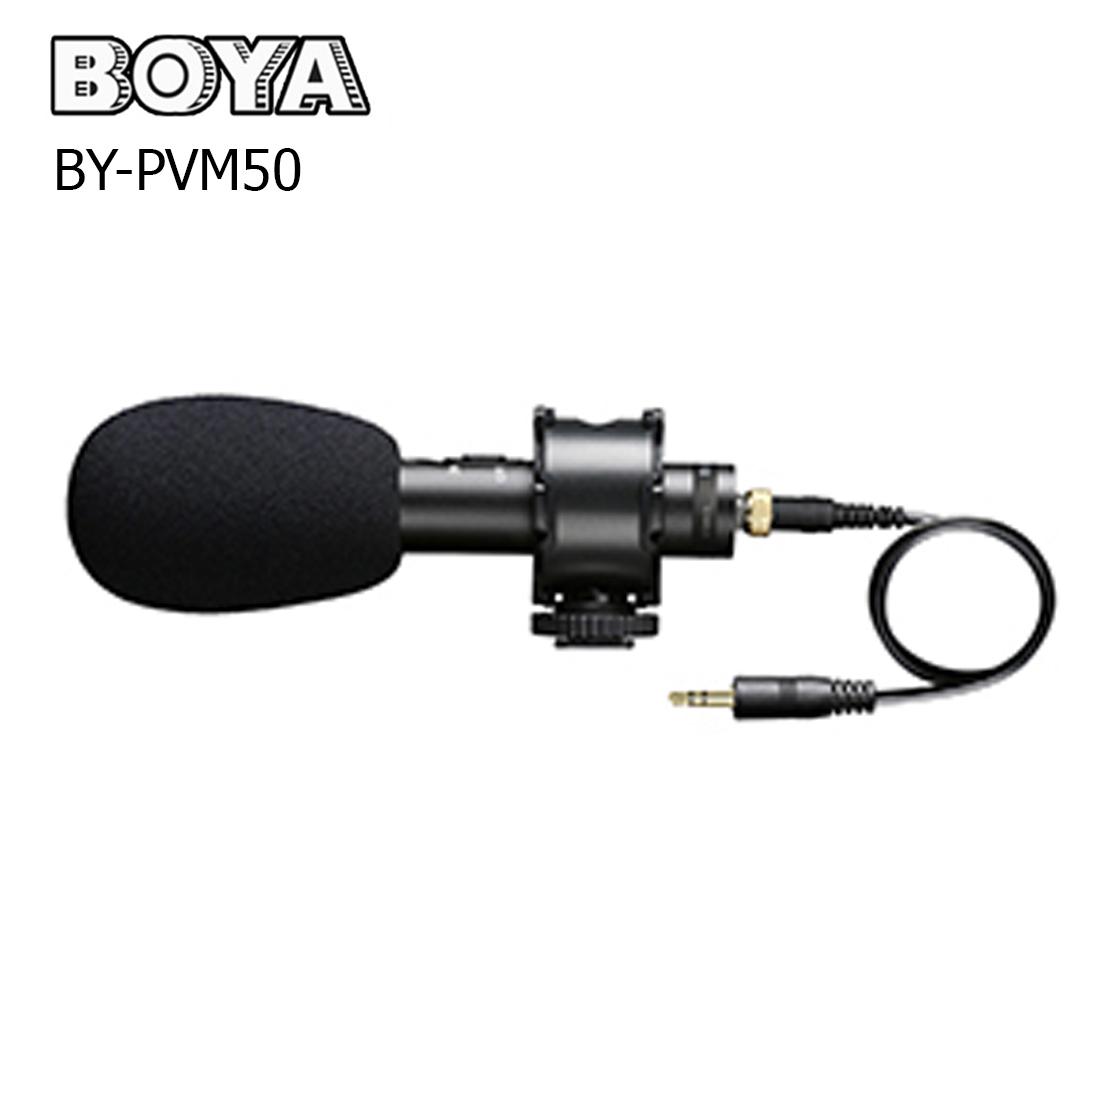 BOYA BY-PVM50 Stereo X/Y Condenser Microphone